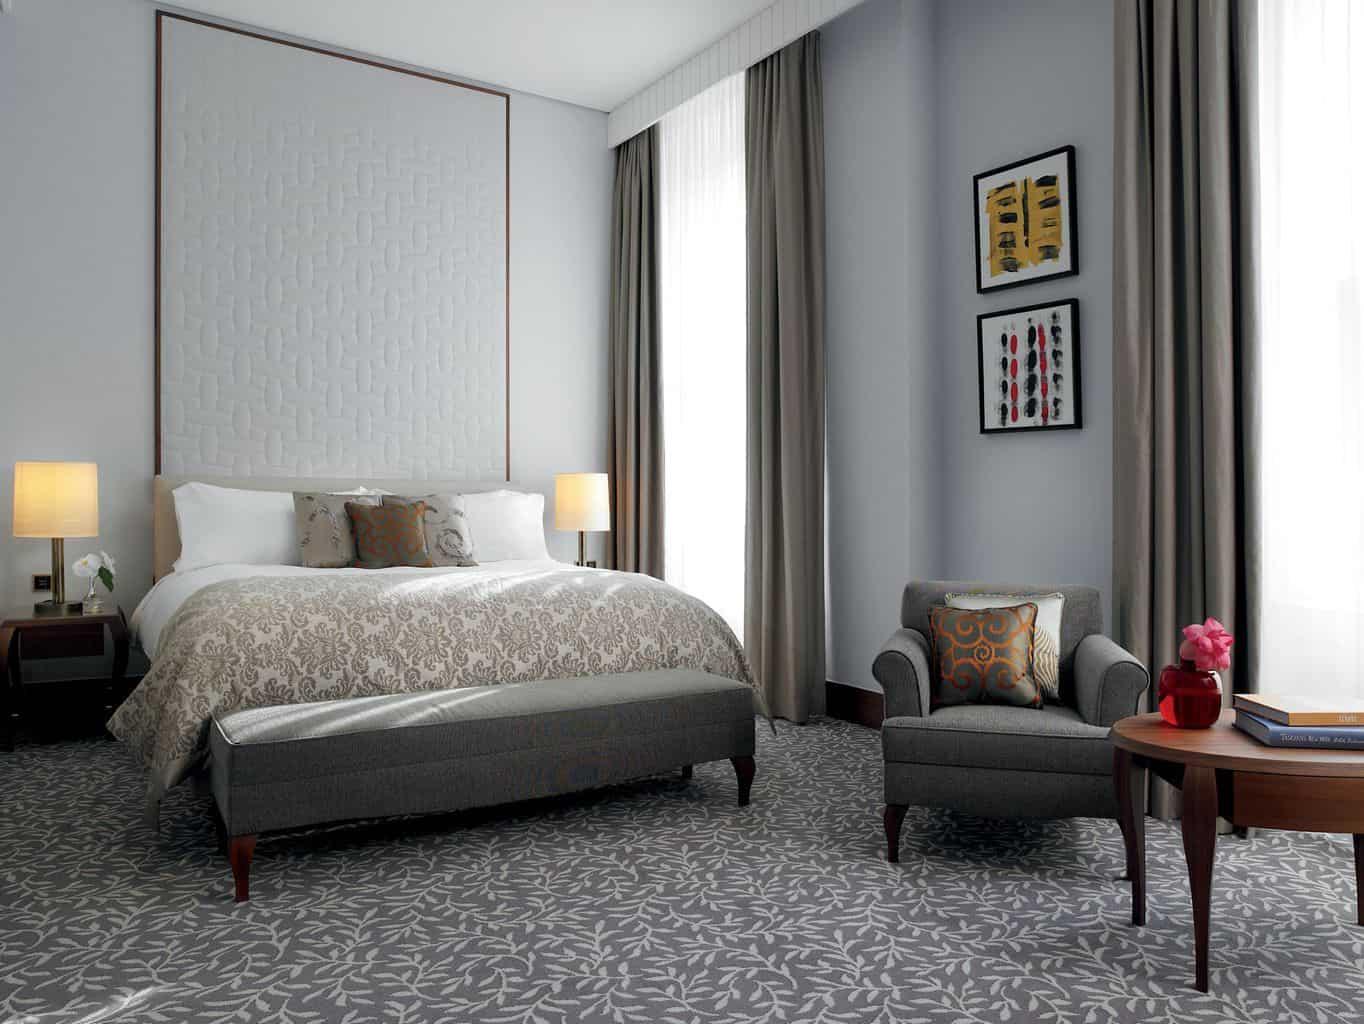 lua-de-mel-austria-The-Ritz-Carlton-Viena